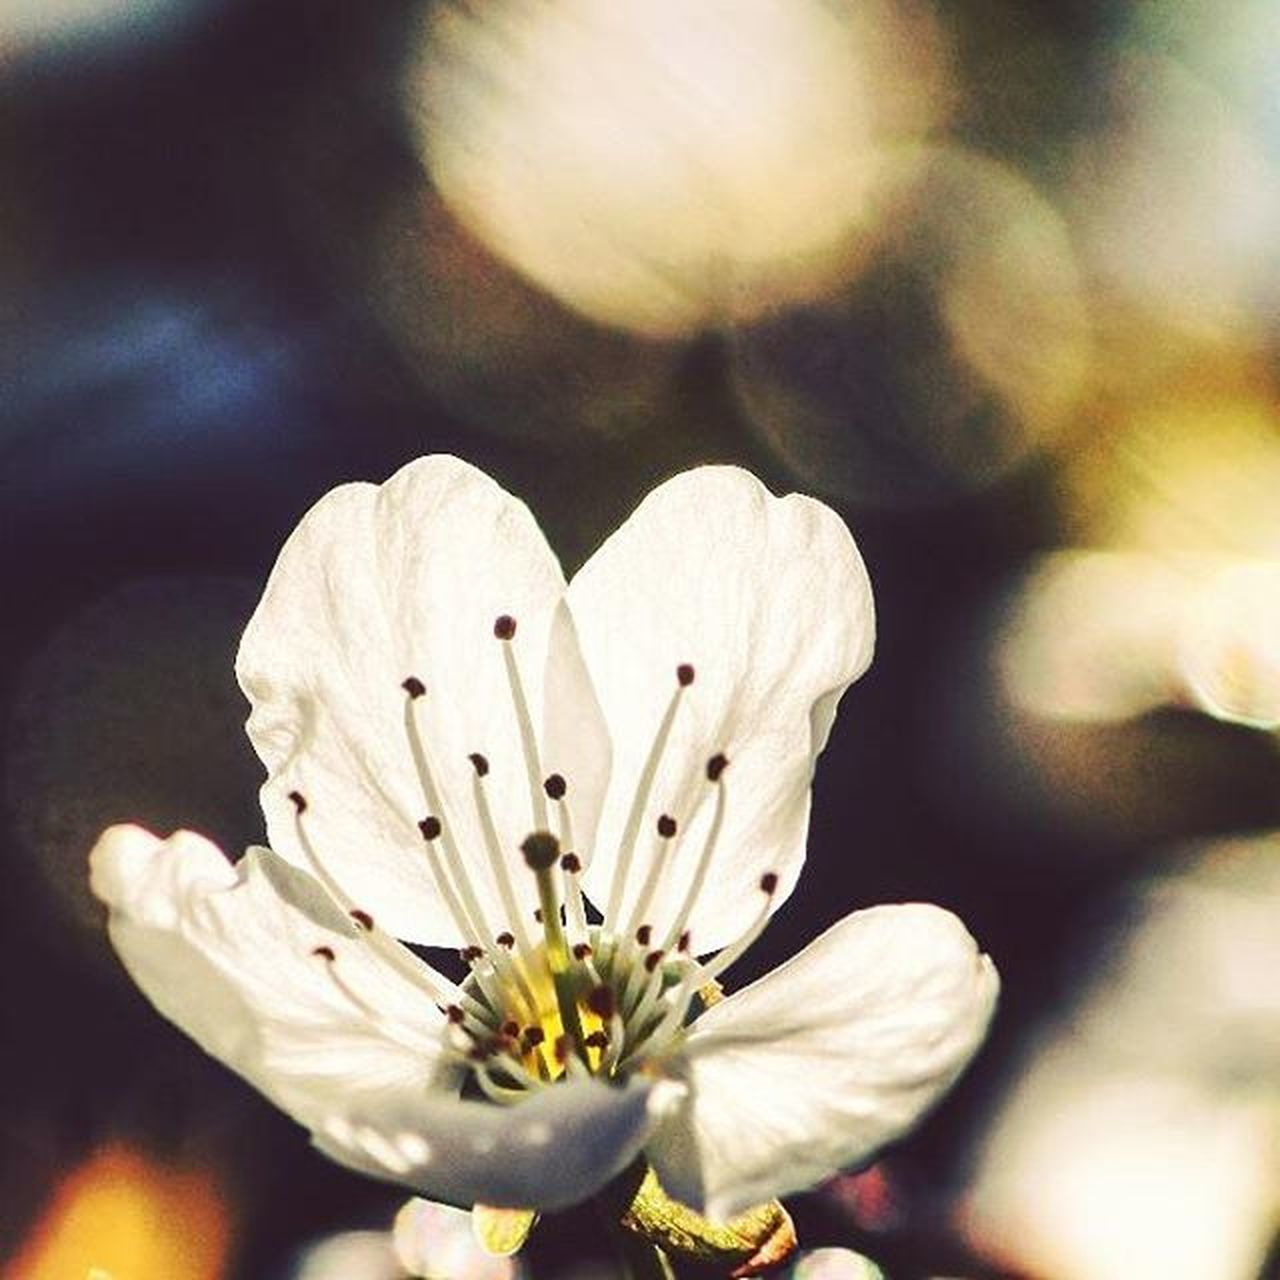 Hey ~ Pixies 🎶 Whateverthishastodowiththisphoto Flower Whyilovespring Cherryblossom Spring Blur Bokeh Bokehlicious Macro_secrets Rsa_nature Rsa_flowers Canon_photos Canon_official Macro Instaamici Nature_perfection Whywelovenature Nature Instagoodmyphoto Vscocam Igersgermany Diewocheaufinstagram Worldbestgram Flowerstagram Flowersofinstagram floweroftheday 🌸